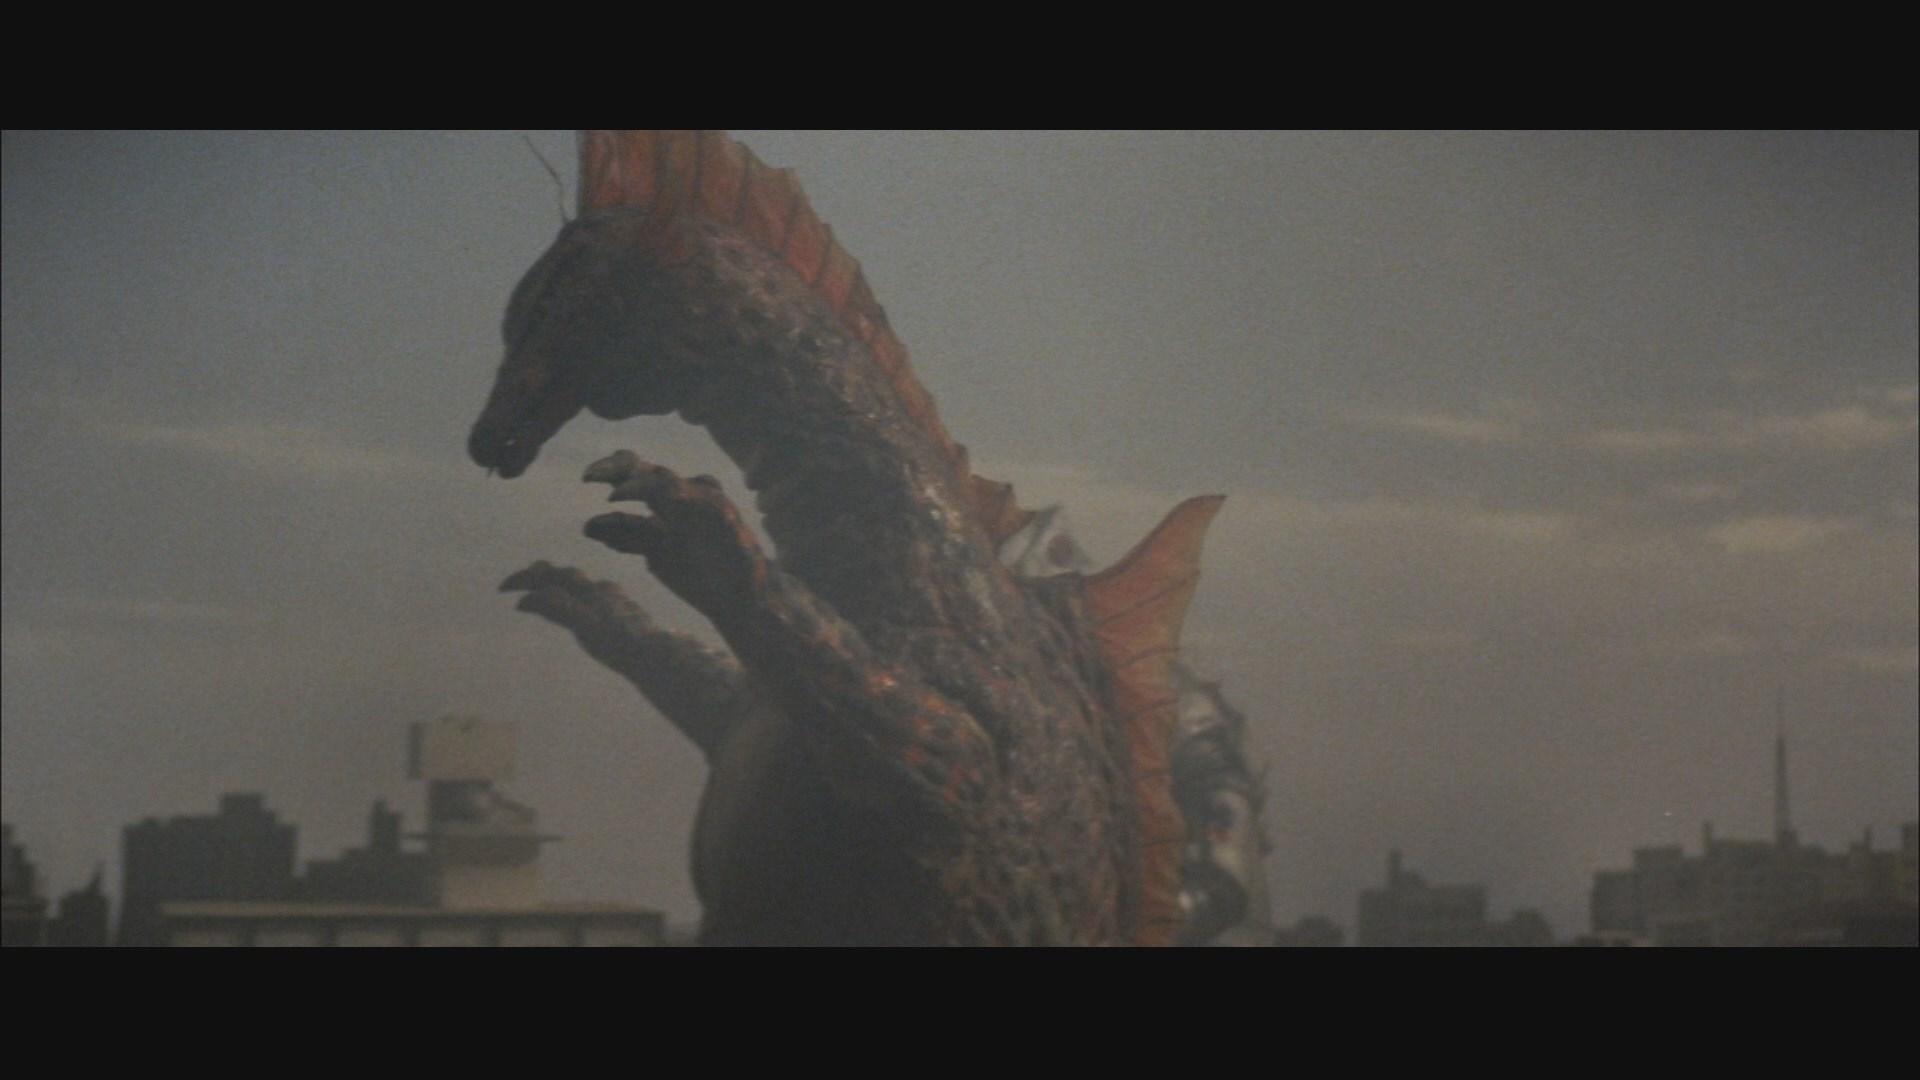 Godzilla vs. Mechagodzilla (1974) + Terror of Mechagodzilla (1975) [Criterion Collection]